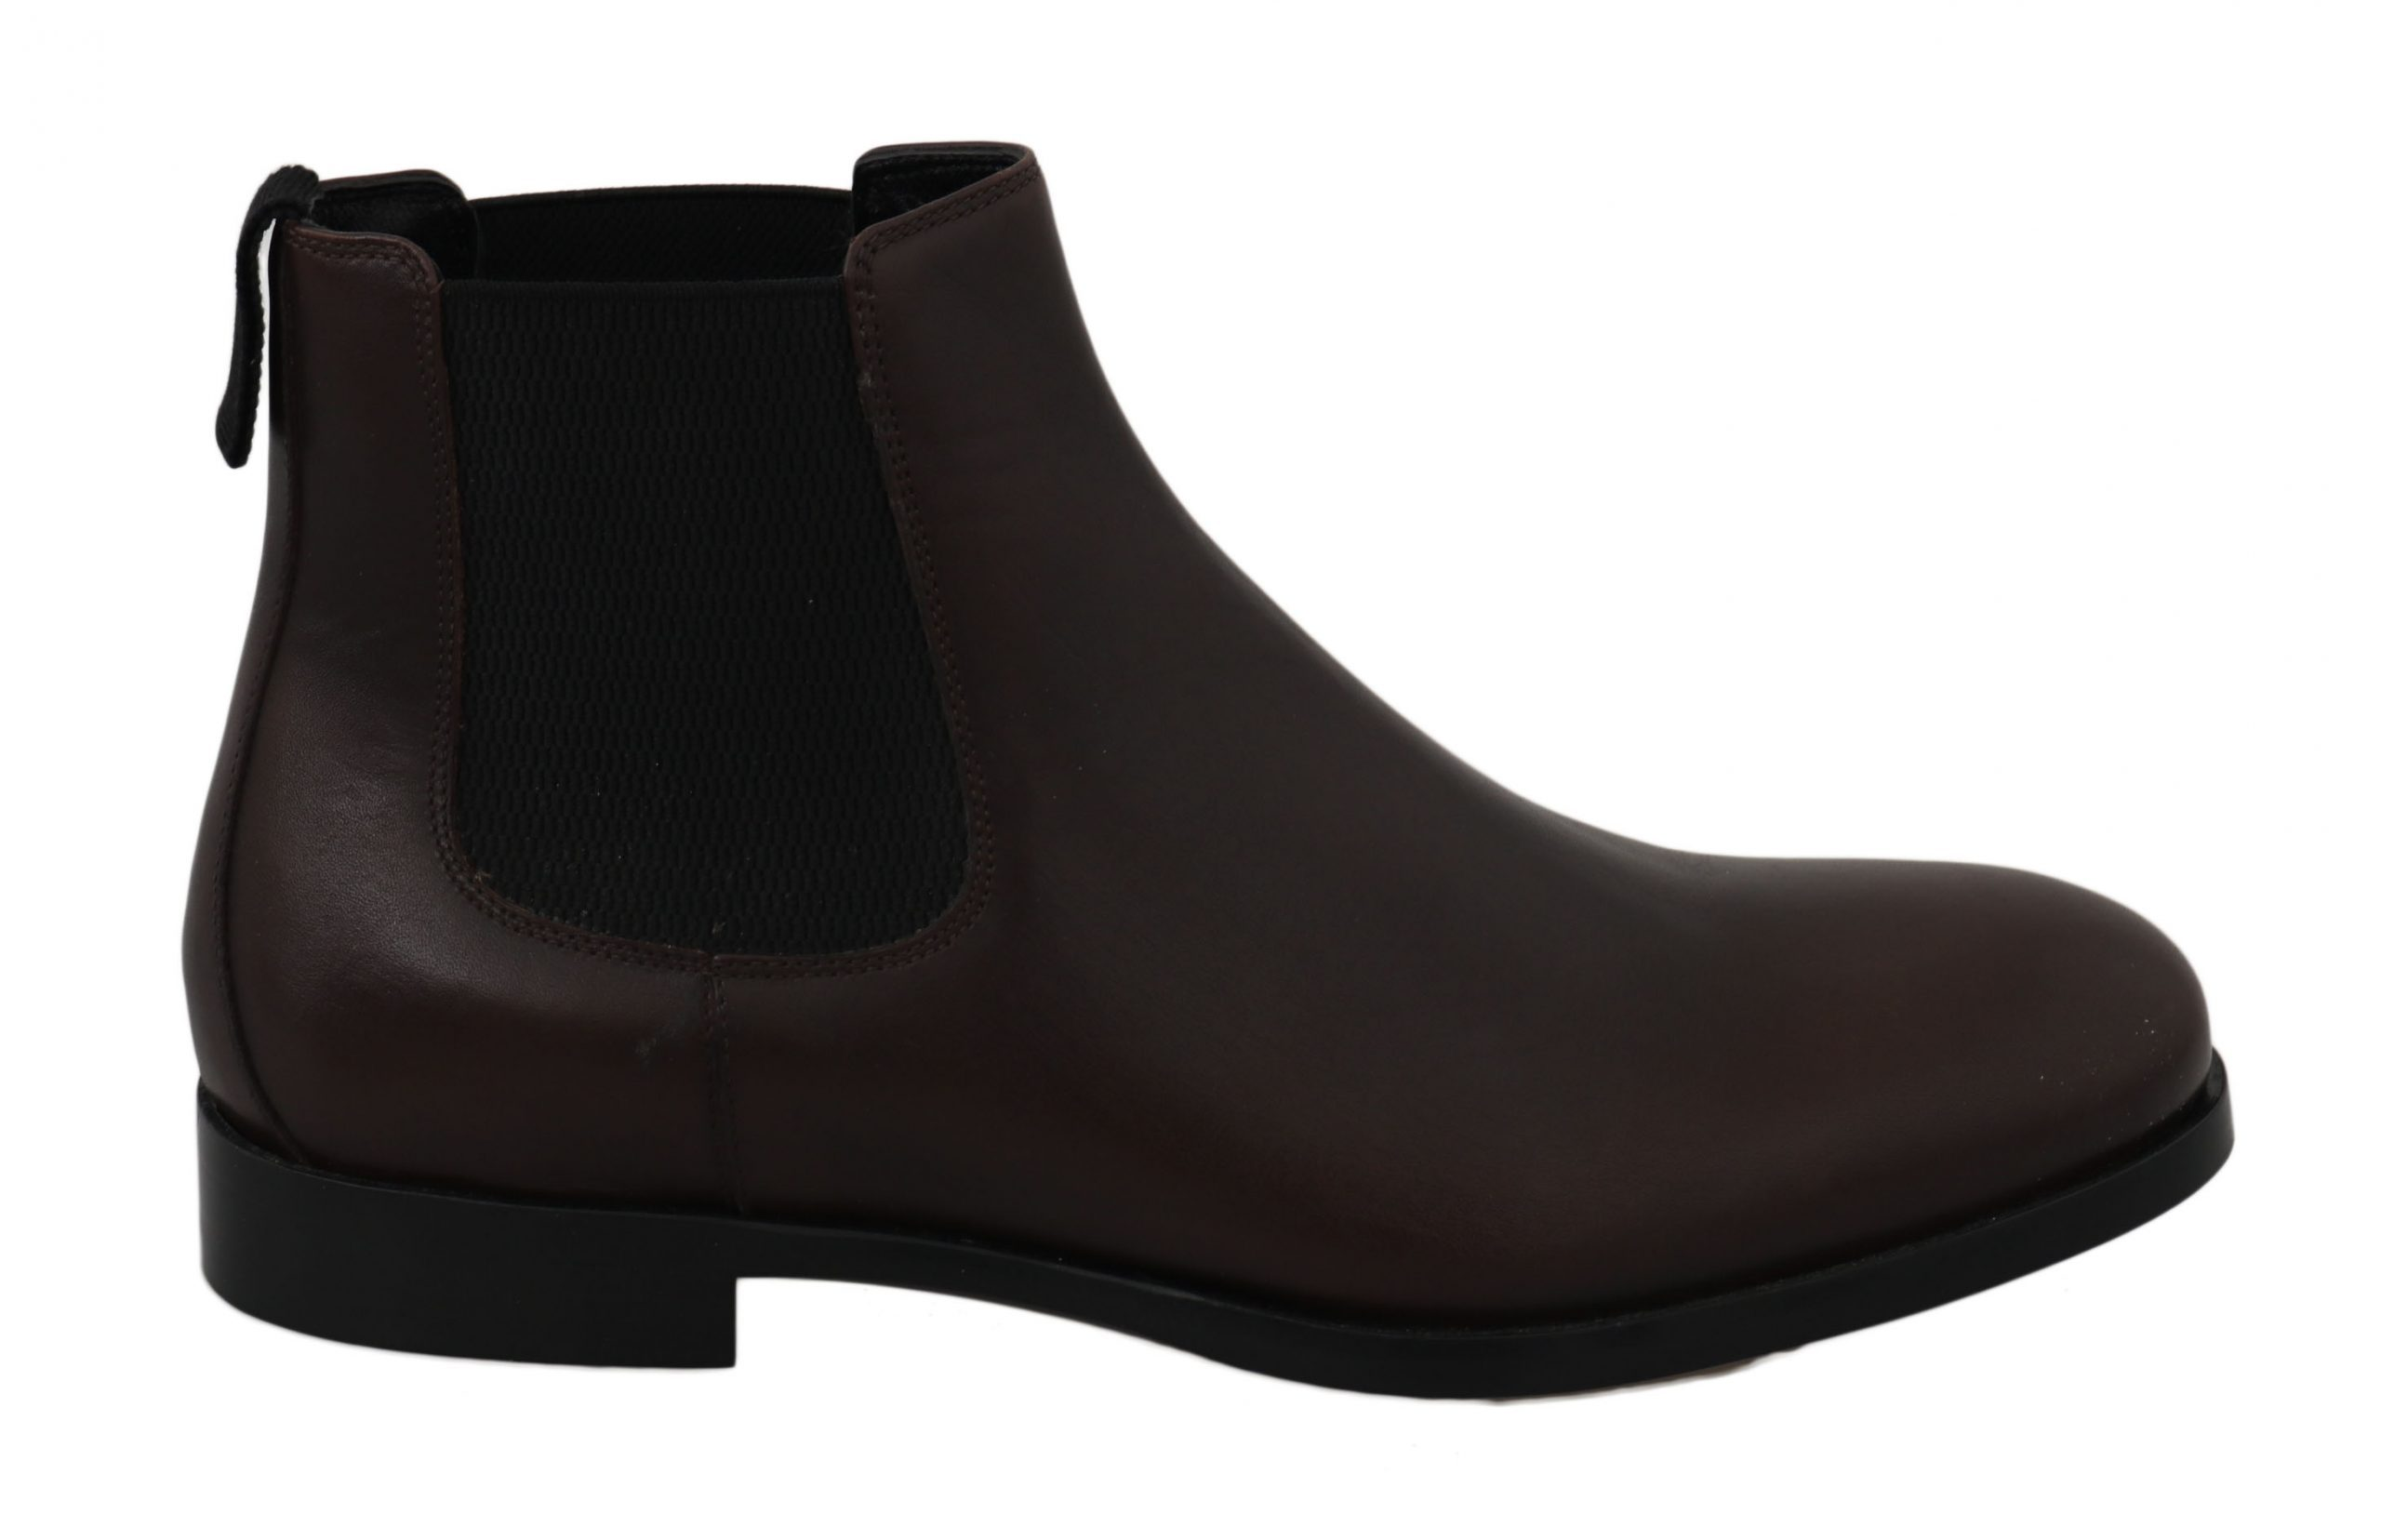 Dolce & Gabbana Men's Shoes Brown MV2331 - EU39/US6